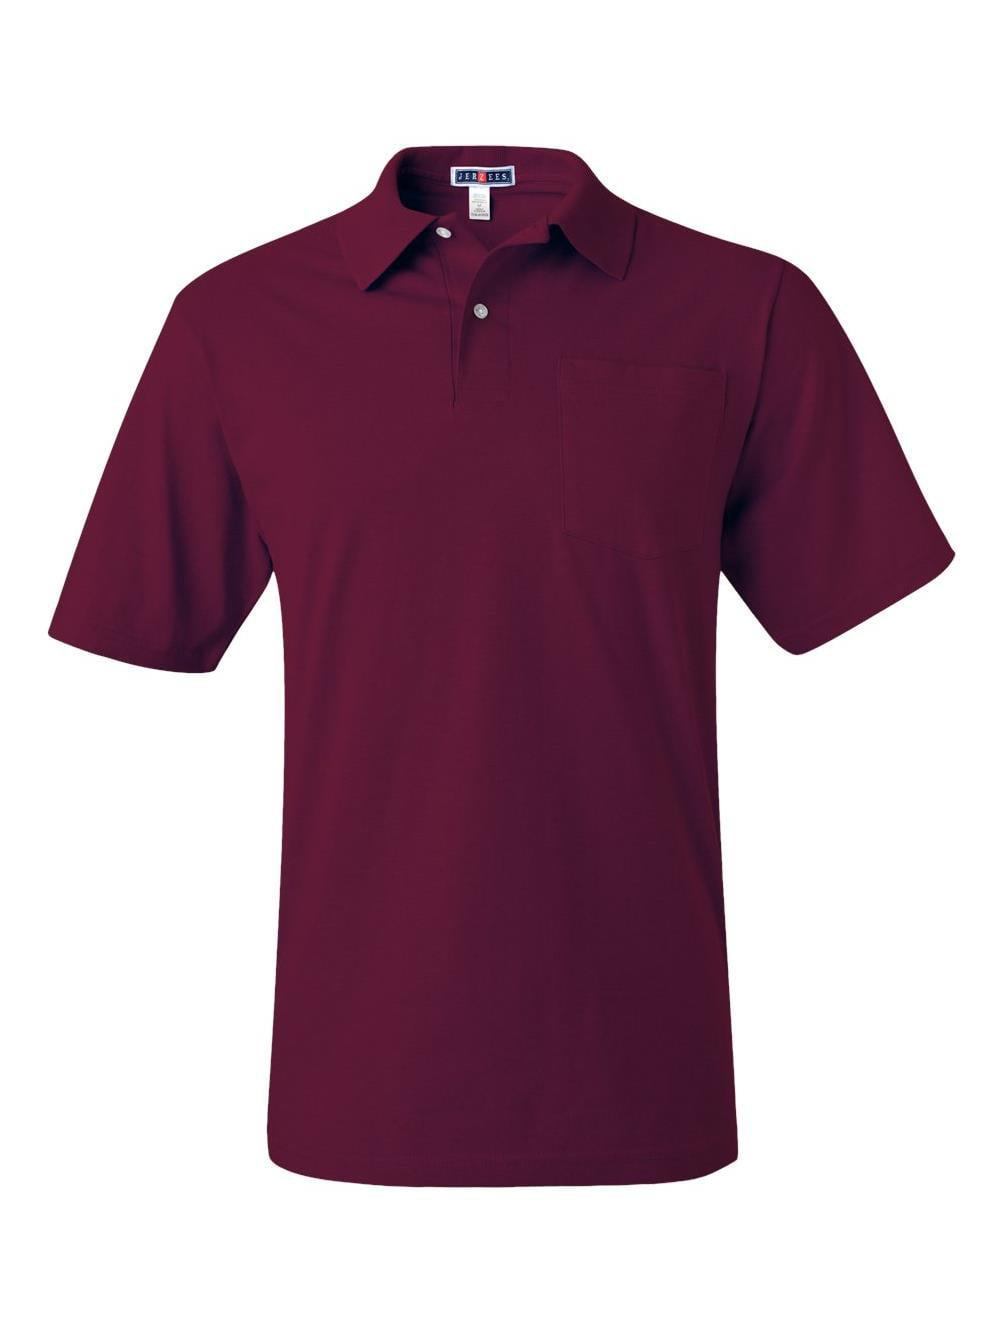 Jerzees Adult 5.6 oz. SpotShield™ Pocket Jersey Polo